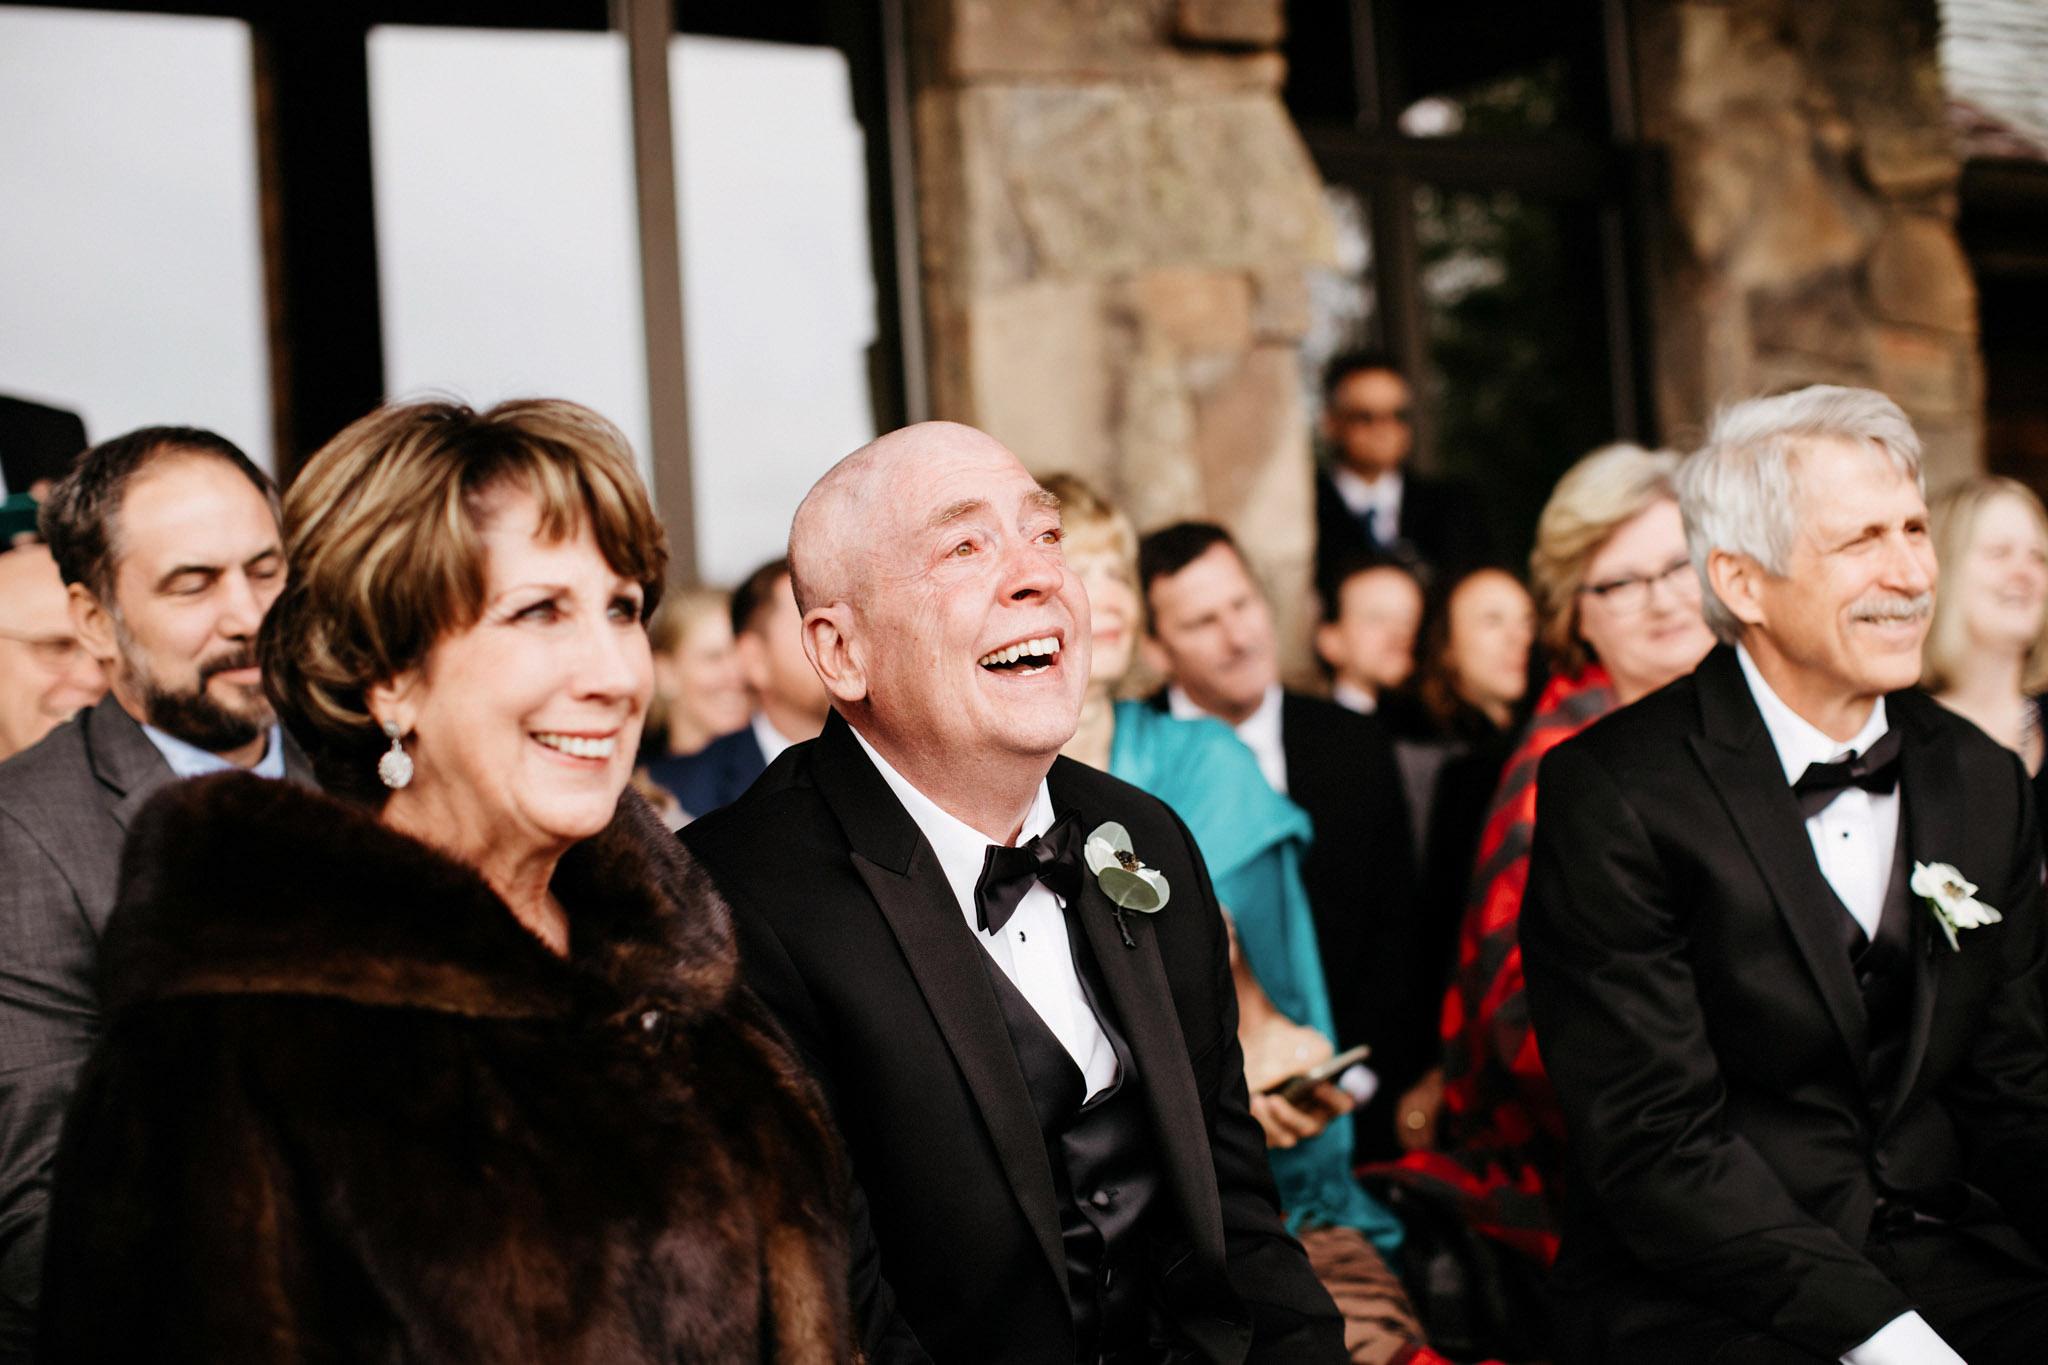 02Aspen Colorado Wedding_Kindling Wedding Photography_12.JPG